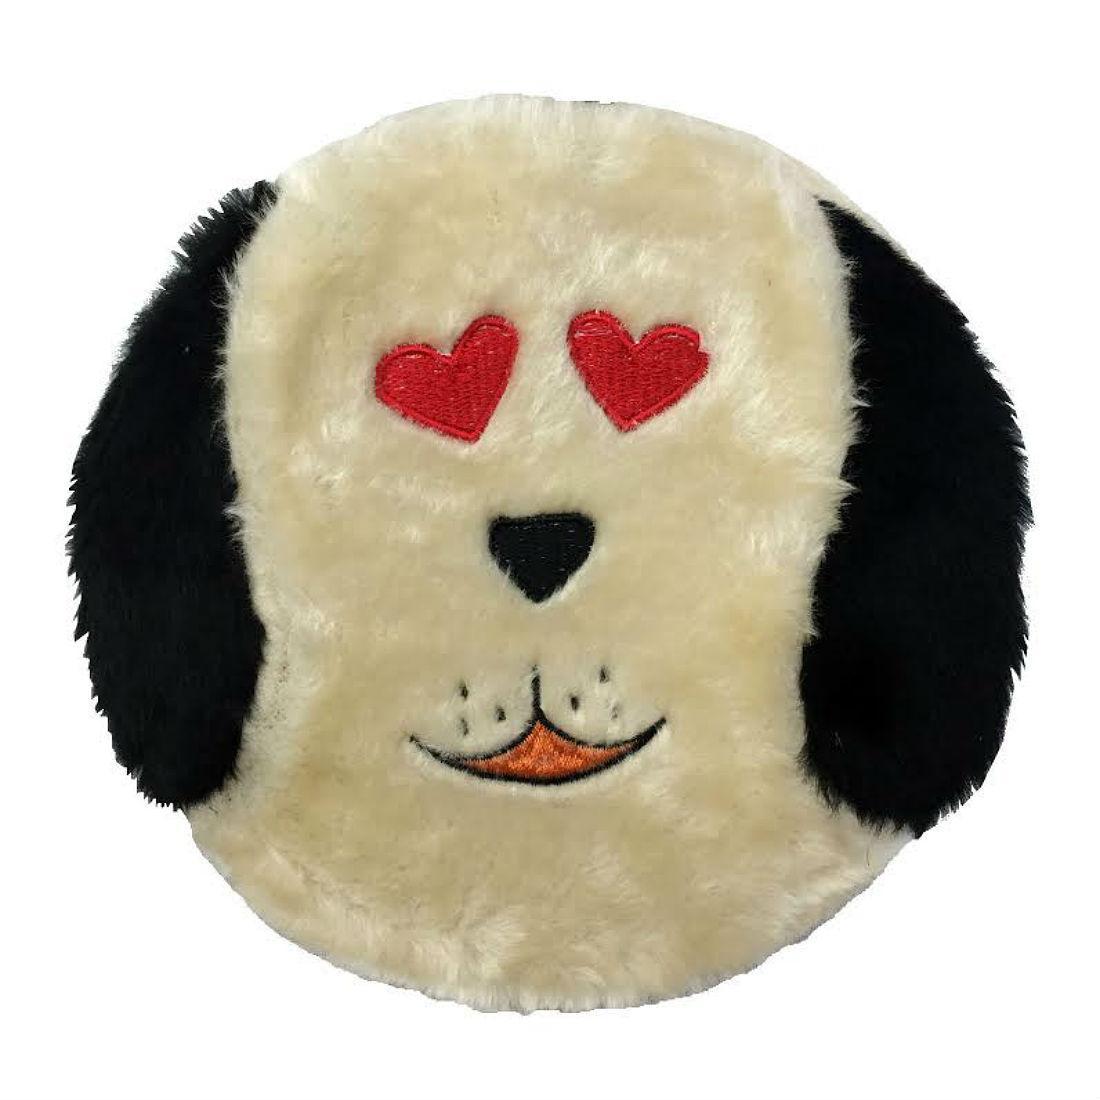 D.O.G'z Plush Dog Toy - I Love You